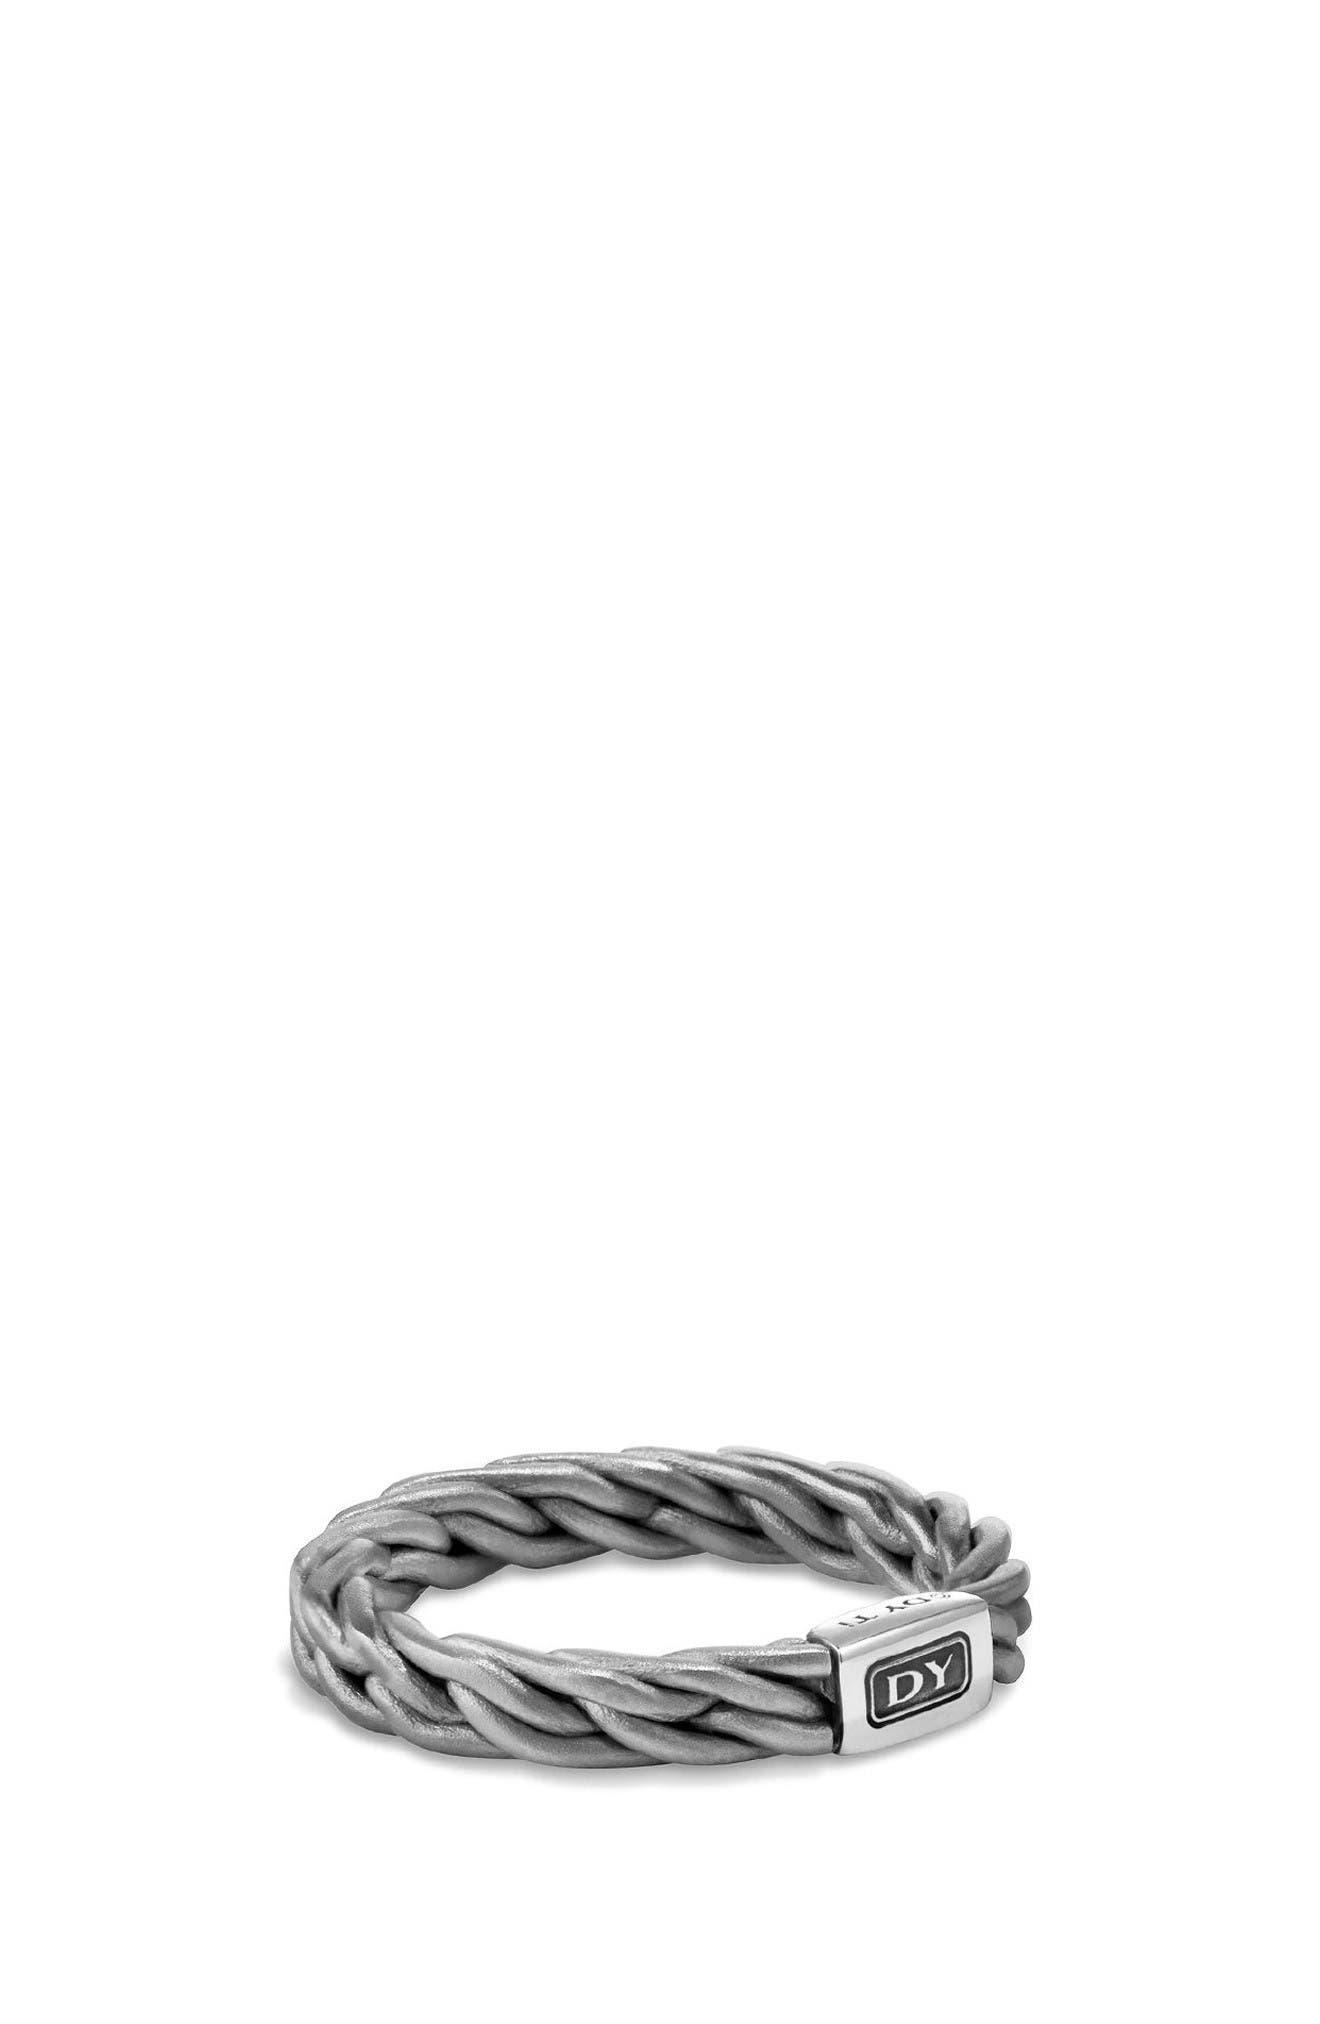 Titanium Band Ring,                             Main thumbnail 1, color,                             Grey/ Titanium